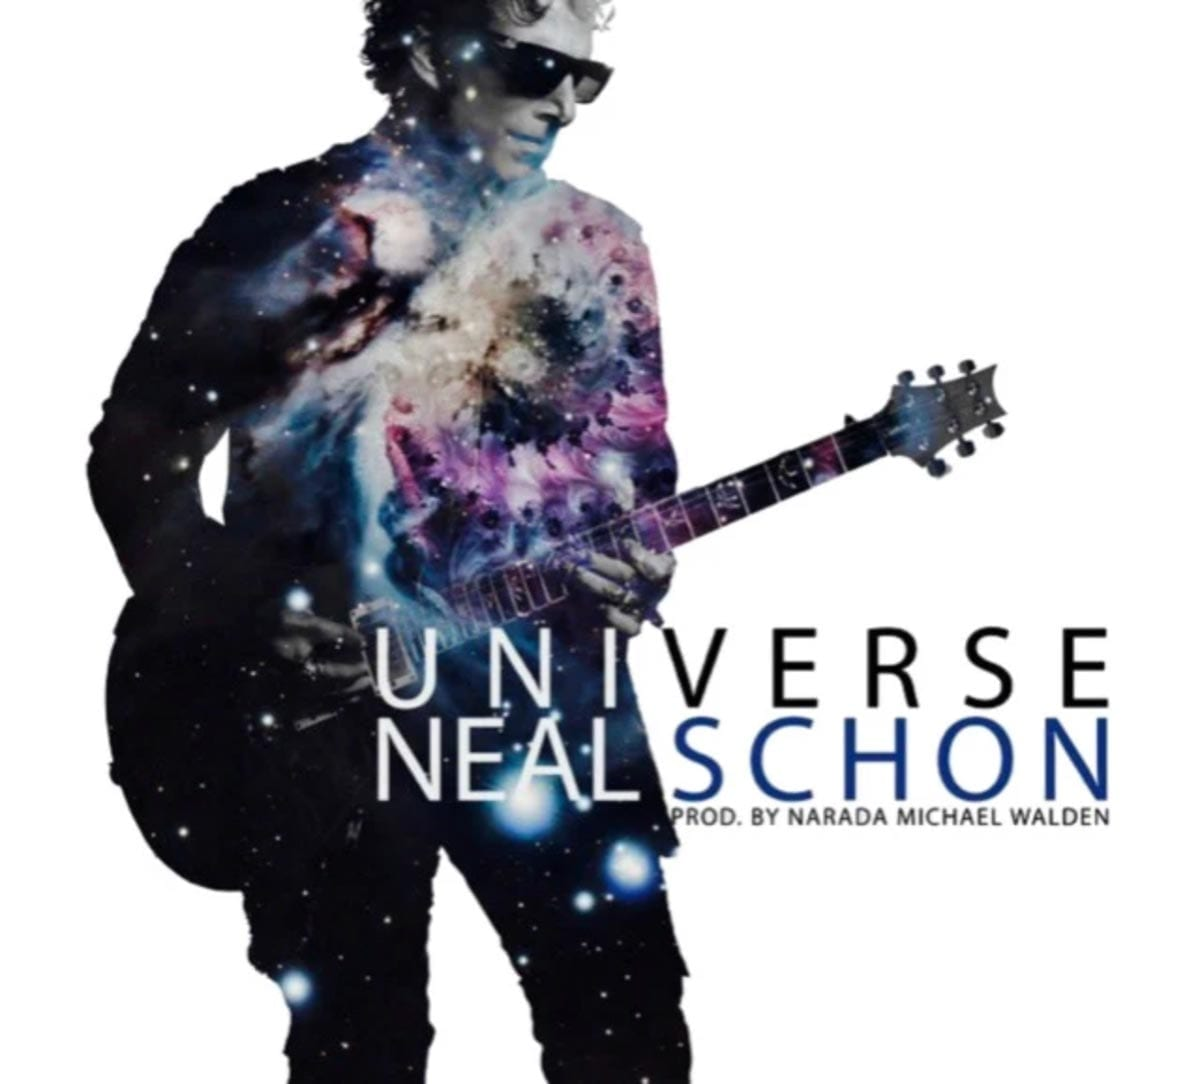 Journey Guitarist Neal Schon Details Solo Album